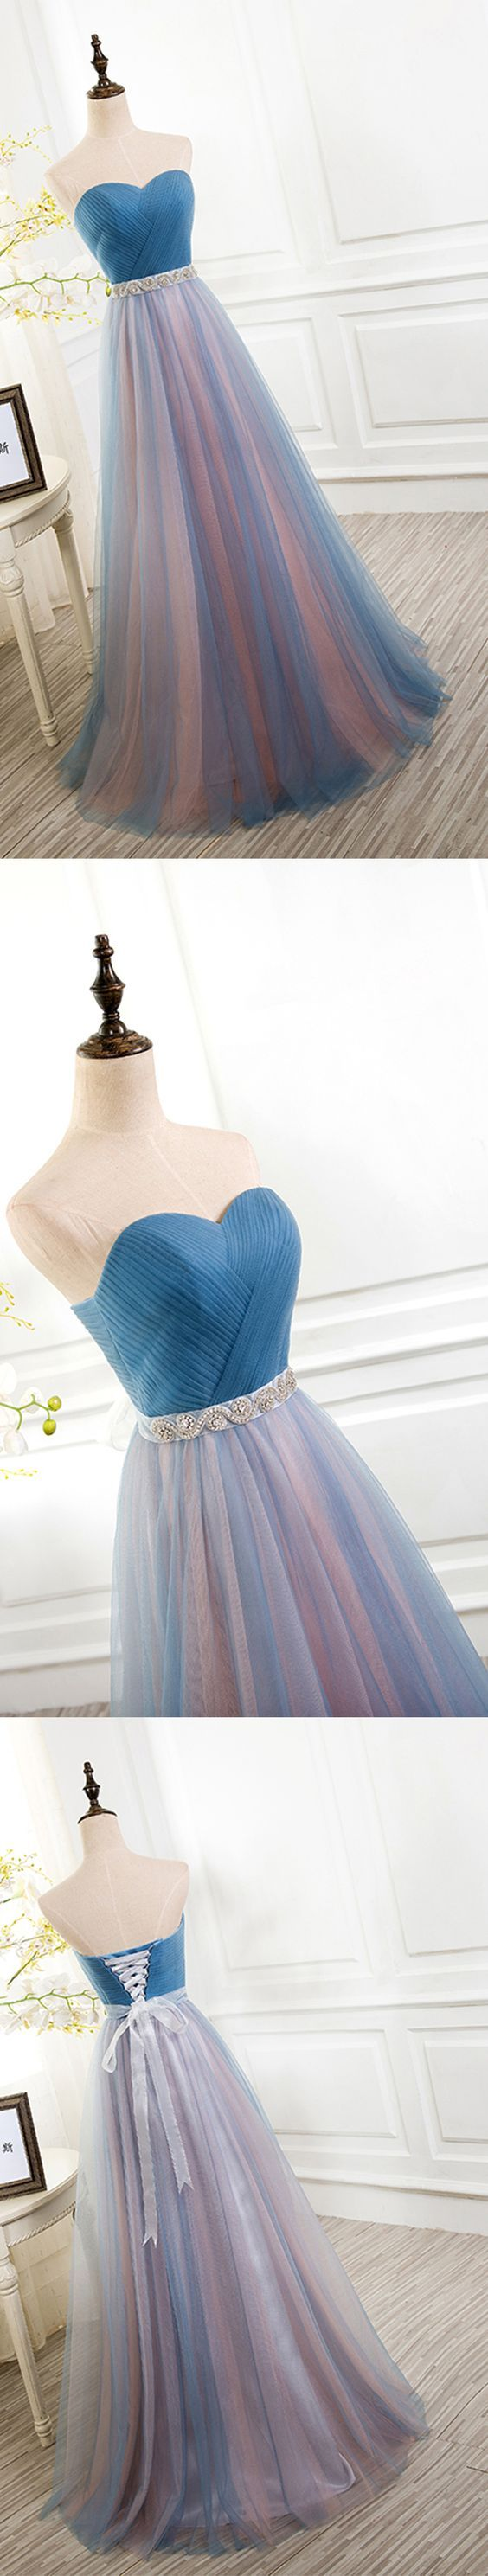 Gorgeous long prom dress sweetheart tulle prom dress promdresses